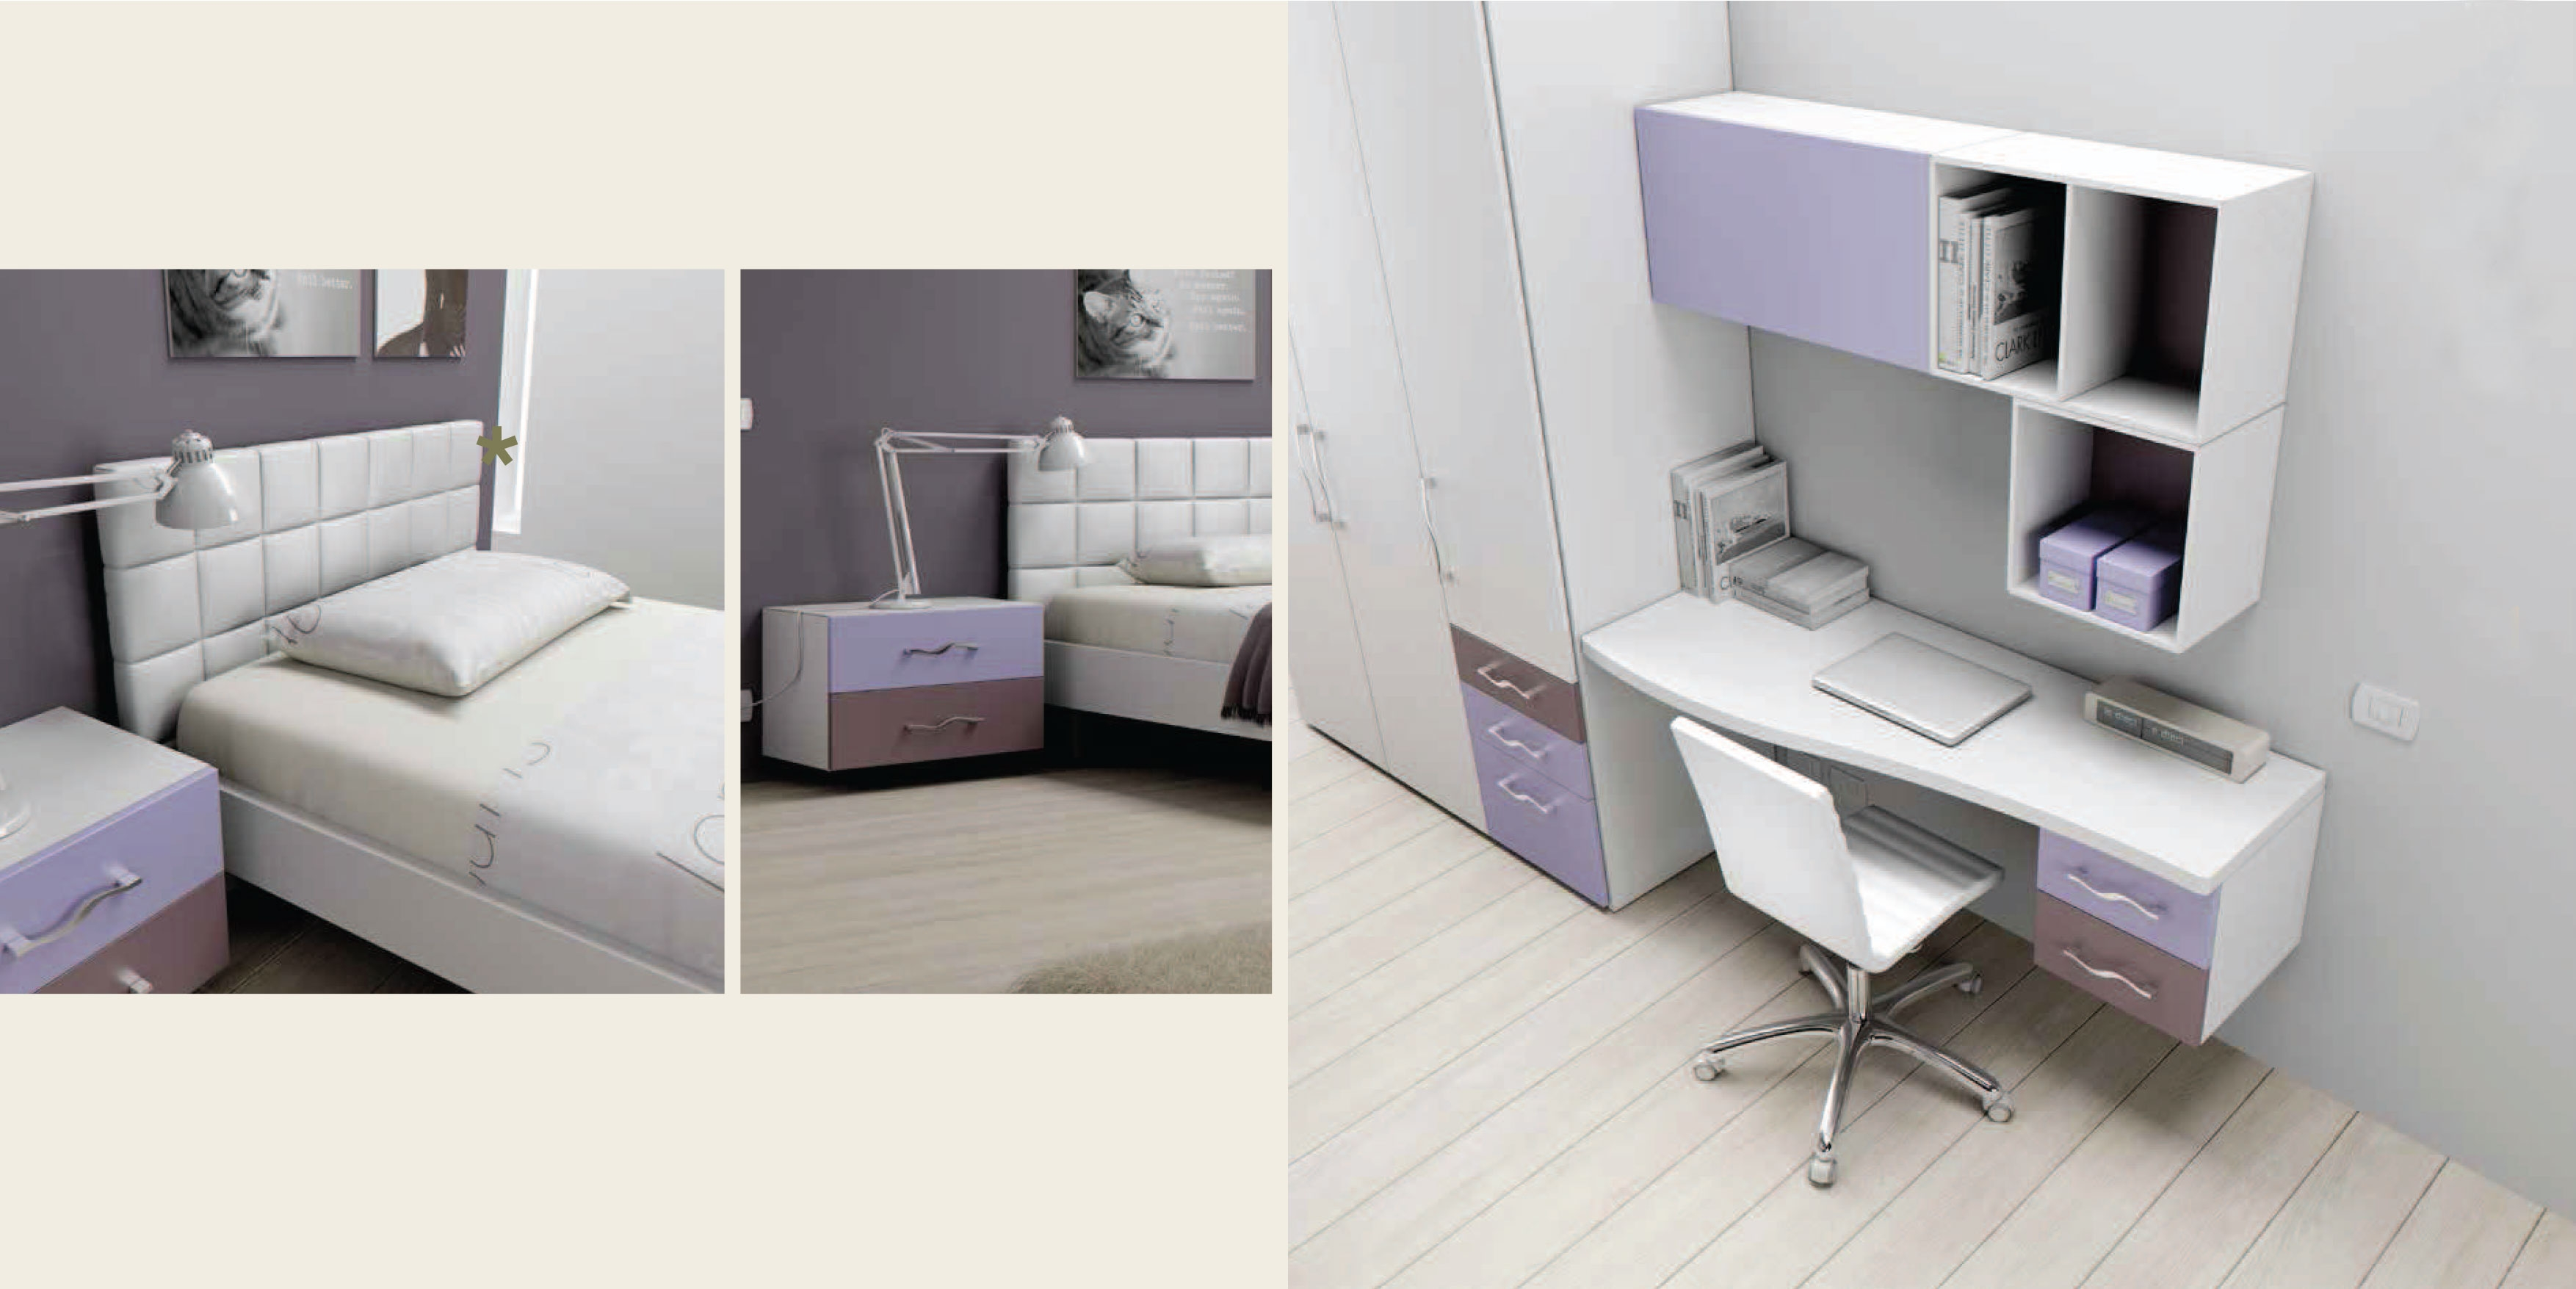 chambre enfant avec lit ado moretti compact so nuit. Black Bedroom Furniture Sets. Home Design Ideas